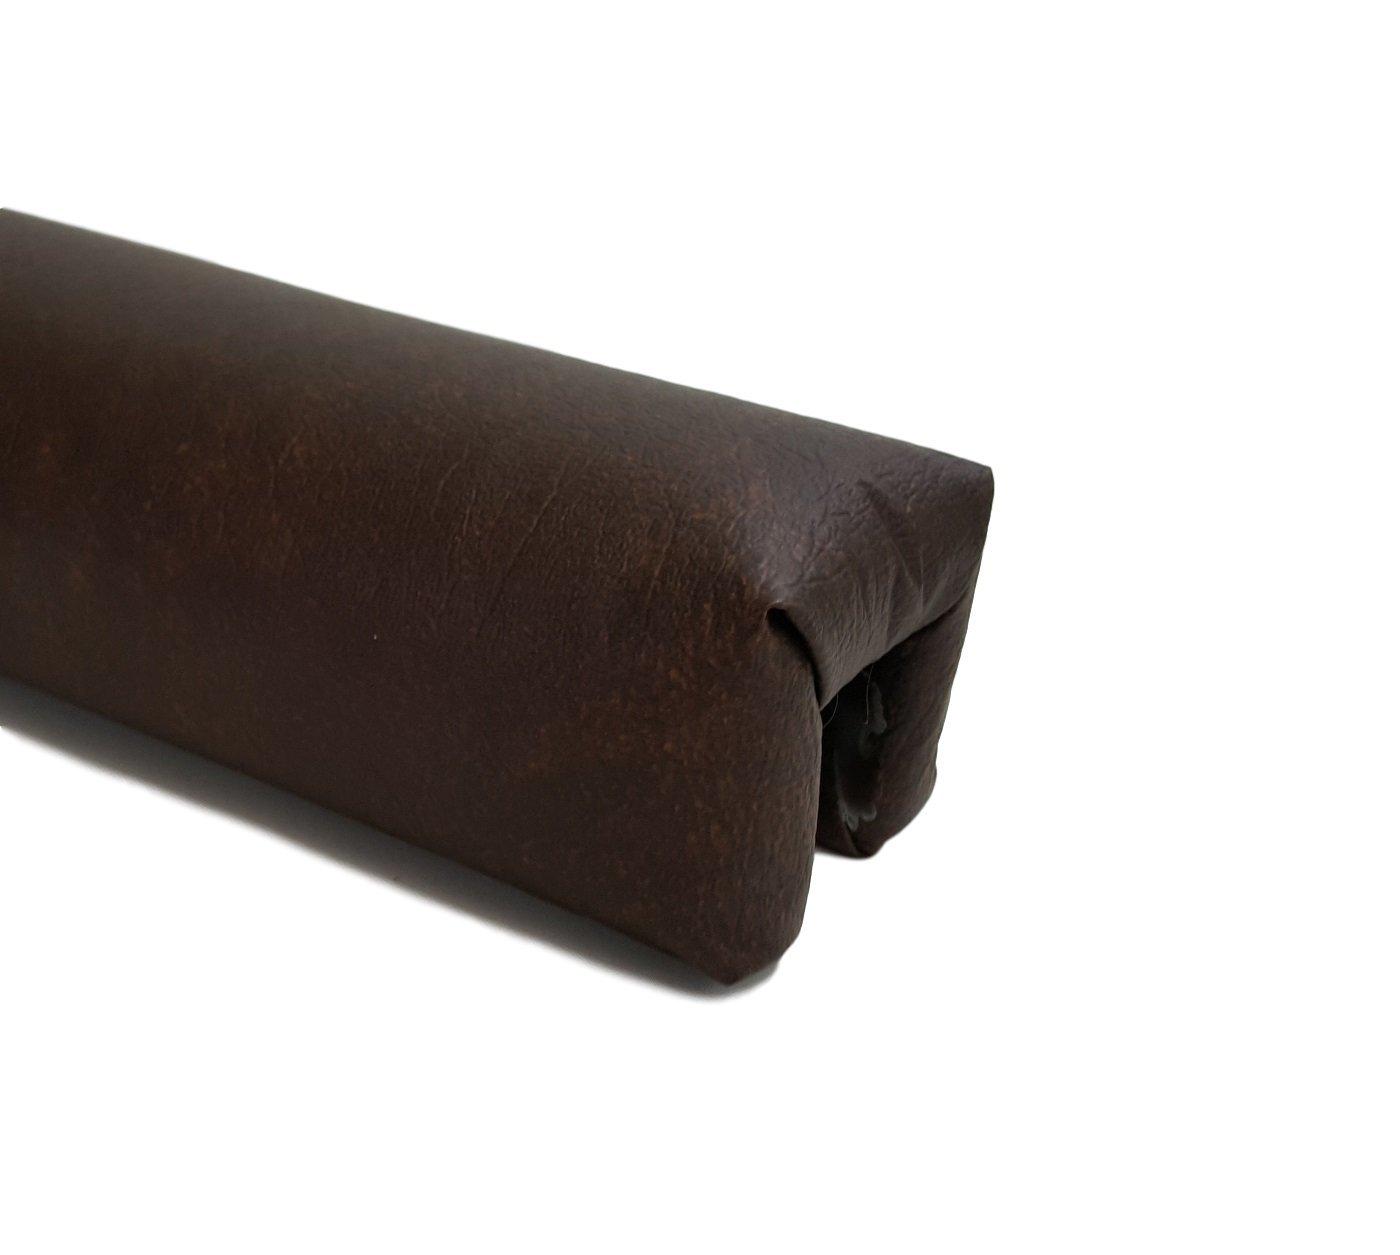 2 pc Waterbed Vinyl Padded Rails - Dark Brown by Flotation Innovations